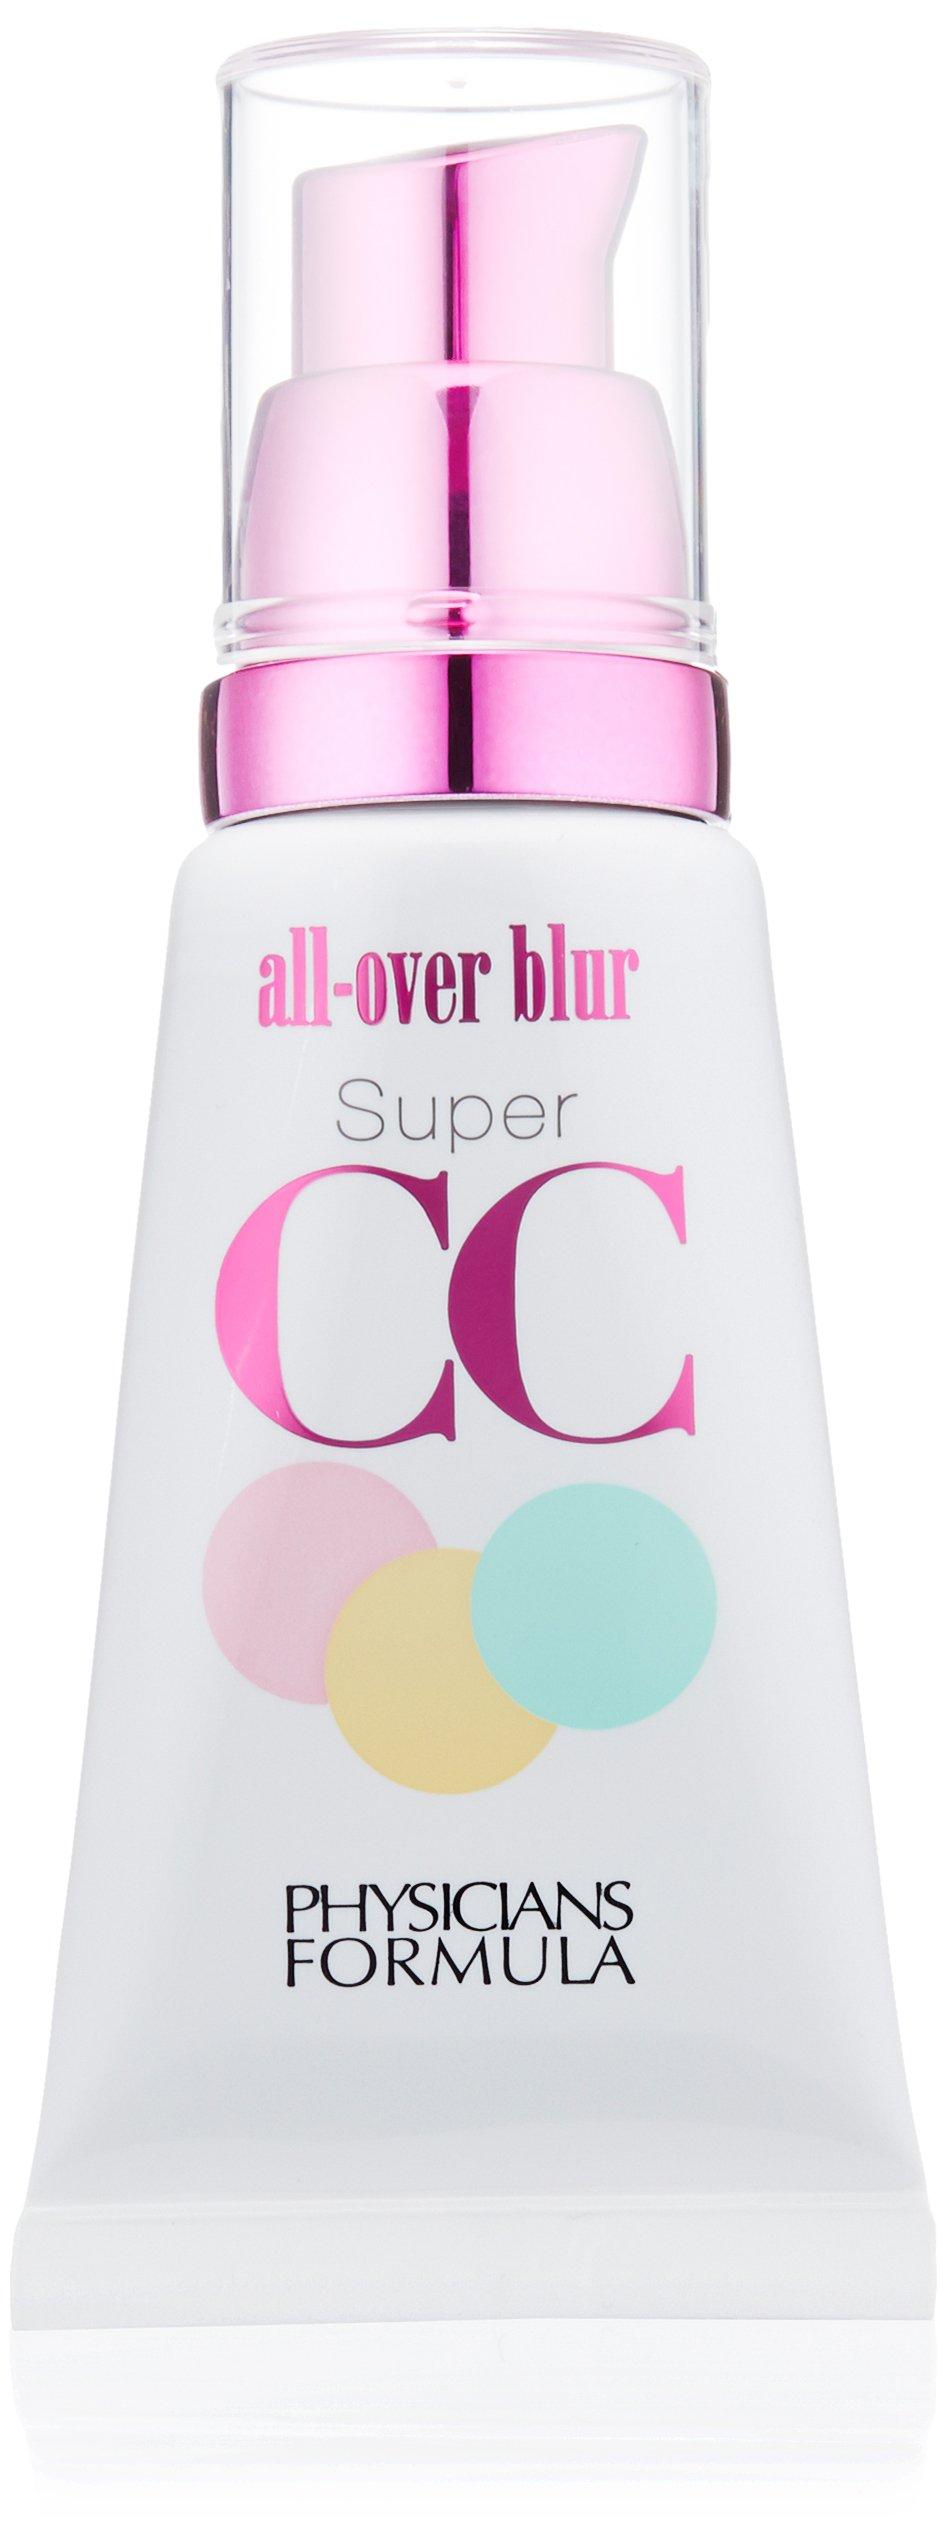 Super BB InstaReady Beauty Balm BB Cream SPF 30 by Physicians Formula #21